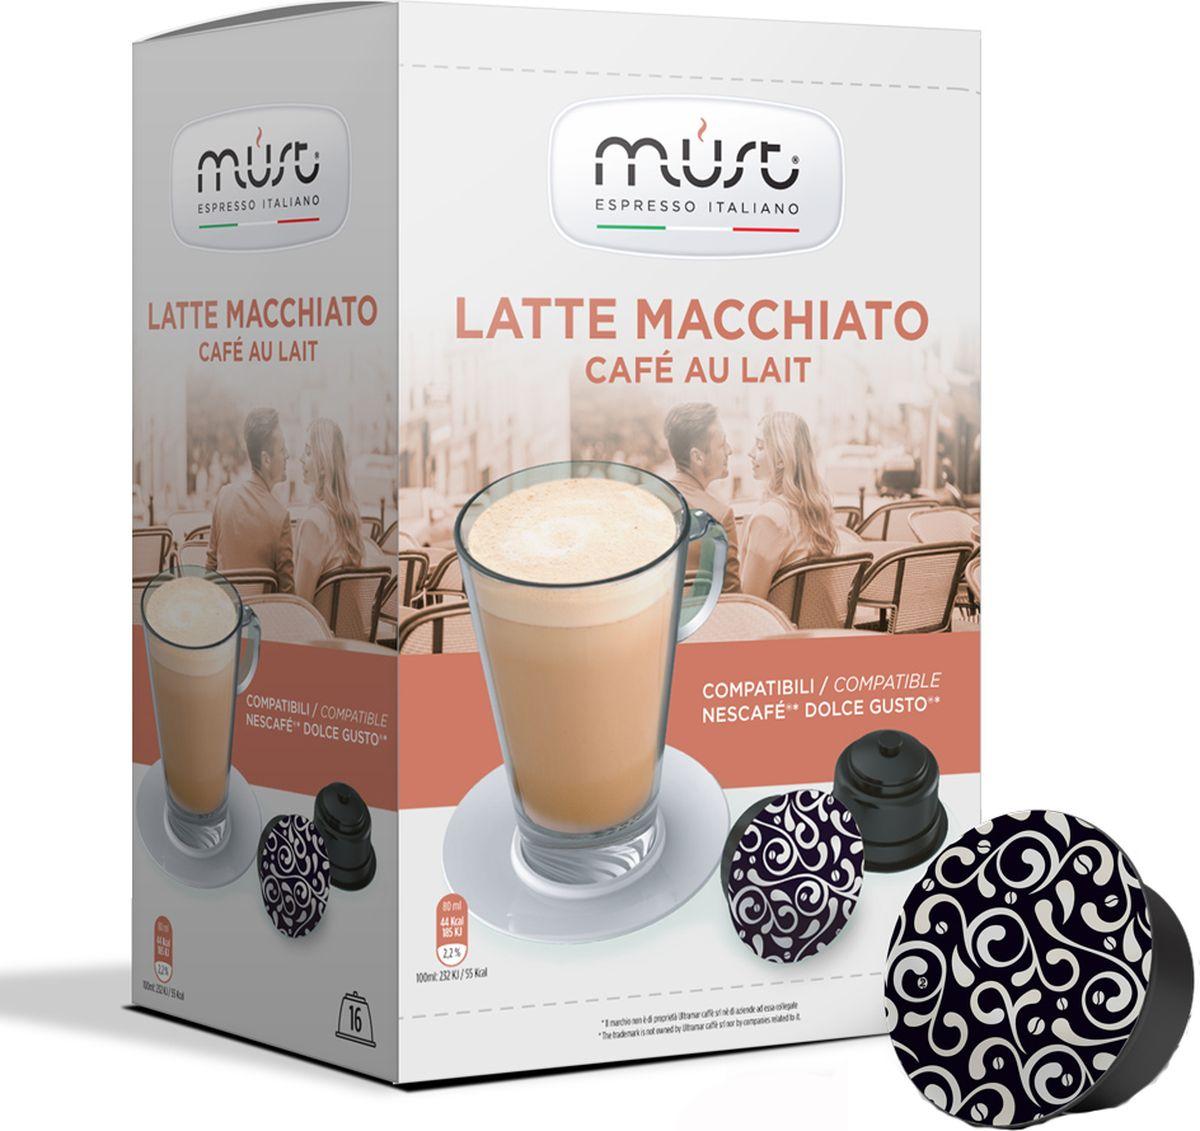 MUST DG Latte Macchiato кофе в капсулах, 16 шт аксессуар delonghi чашки для латте macchiato